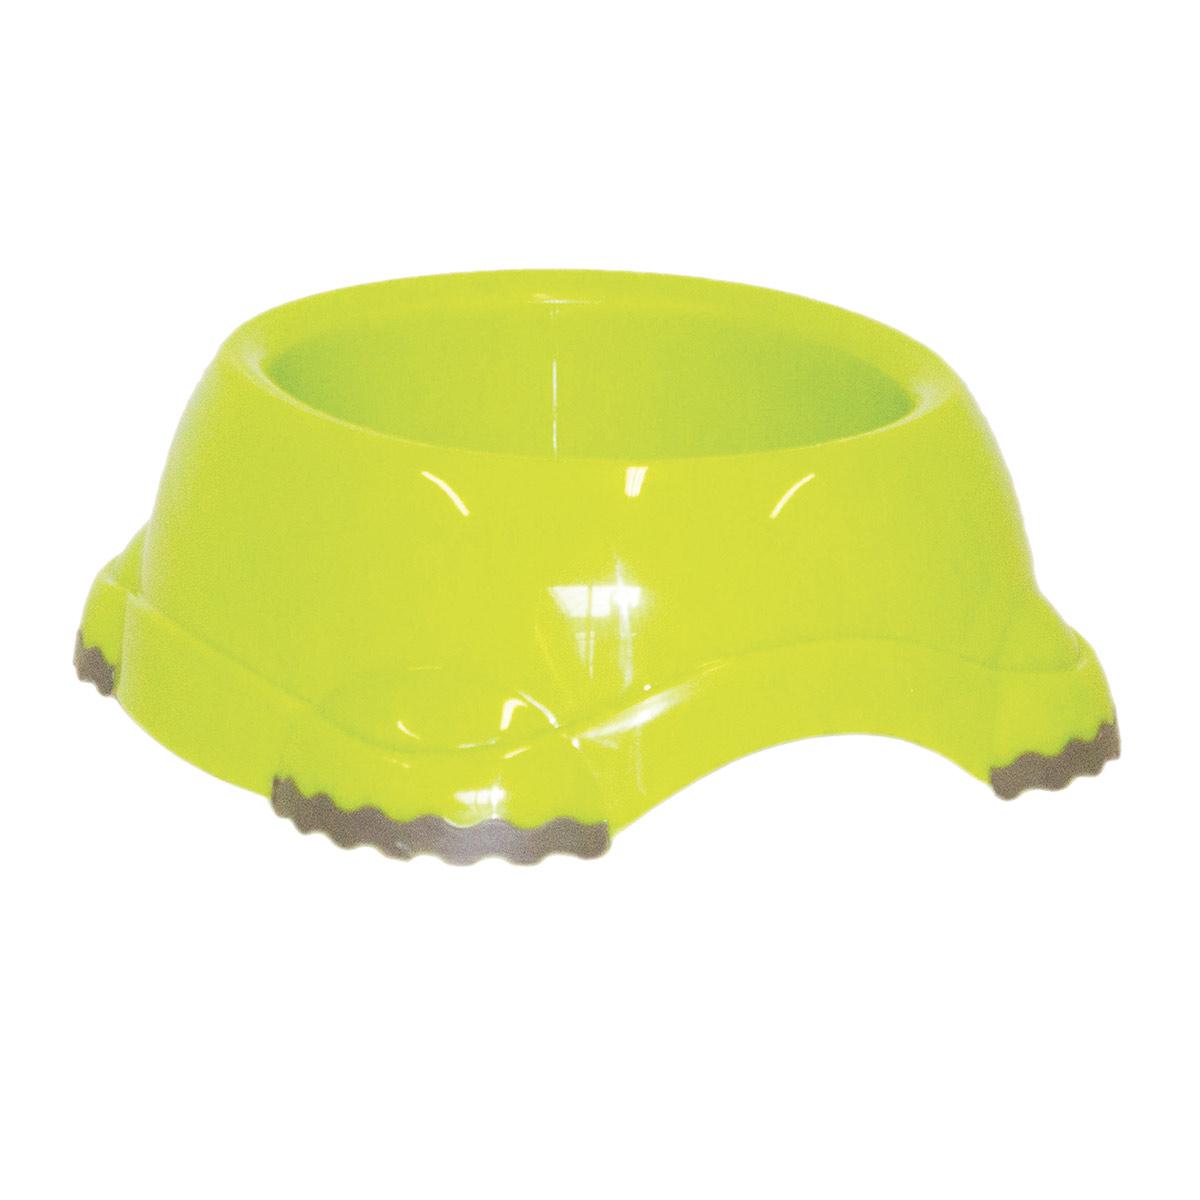 Smarty Bowl Medium Dog Bowl Fun Green 3.1 Cup Capacity